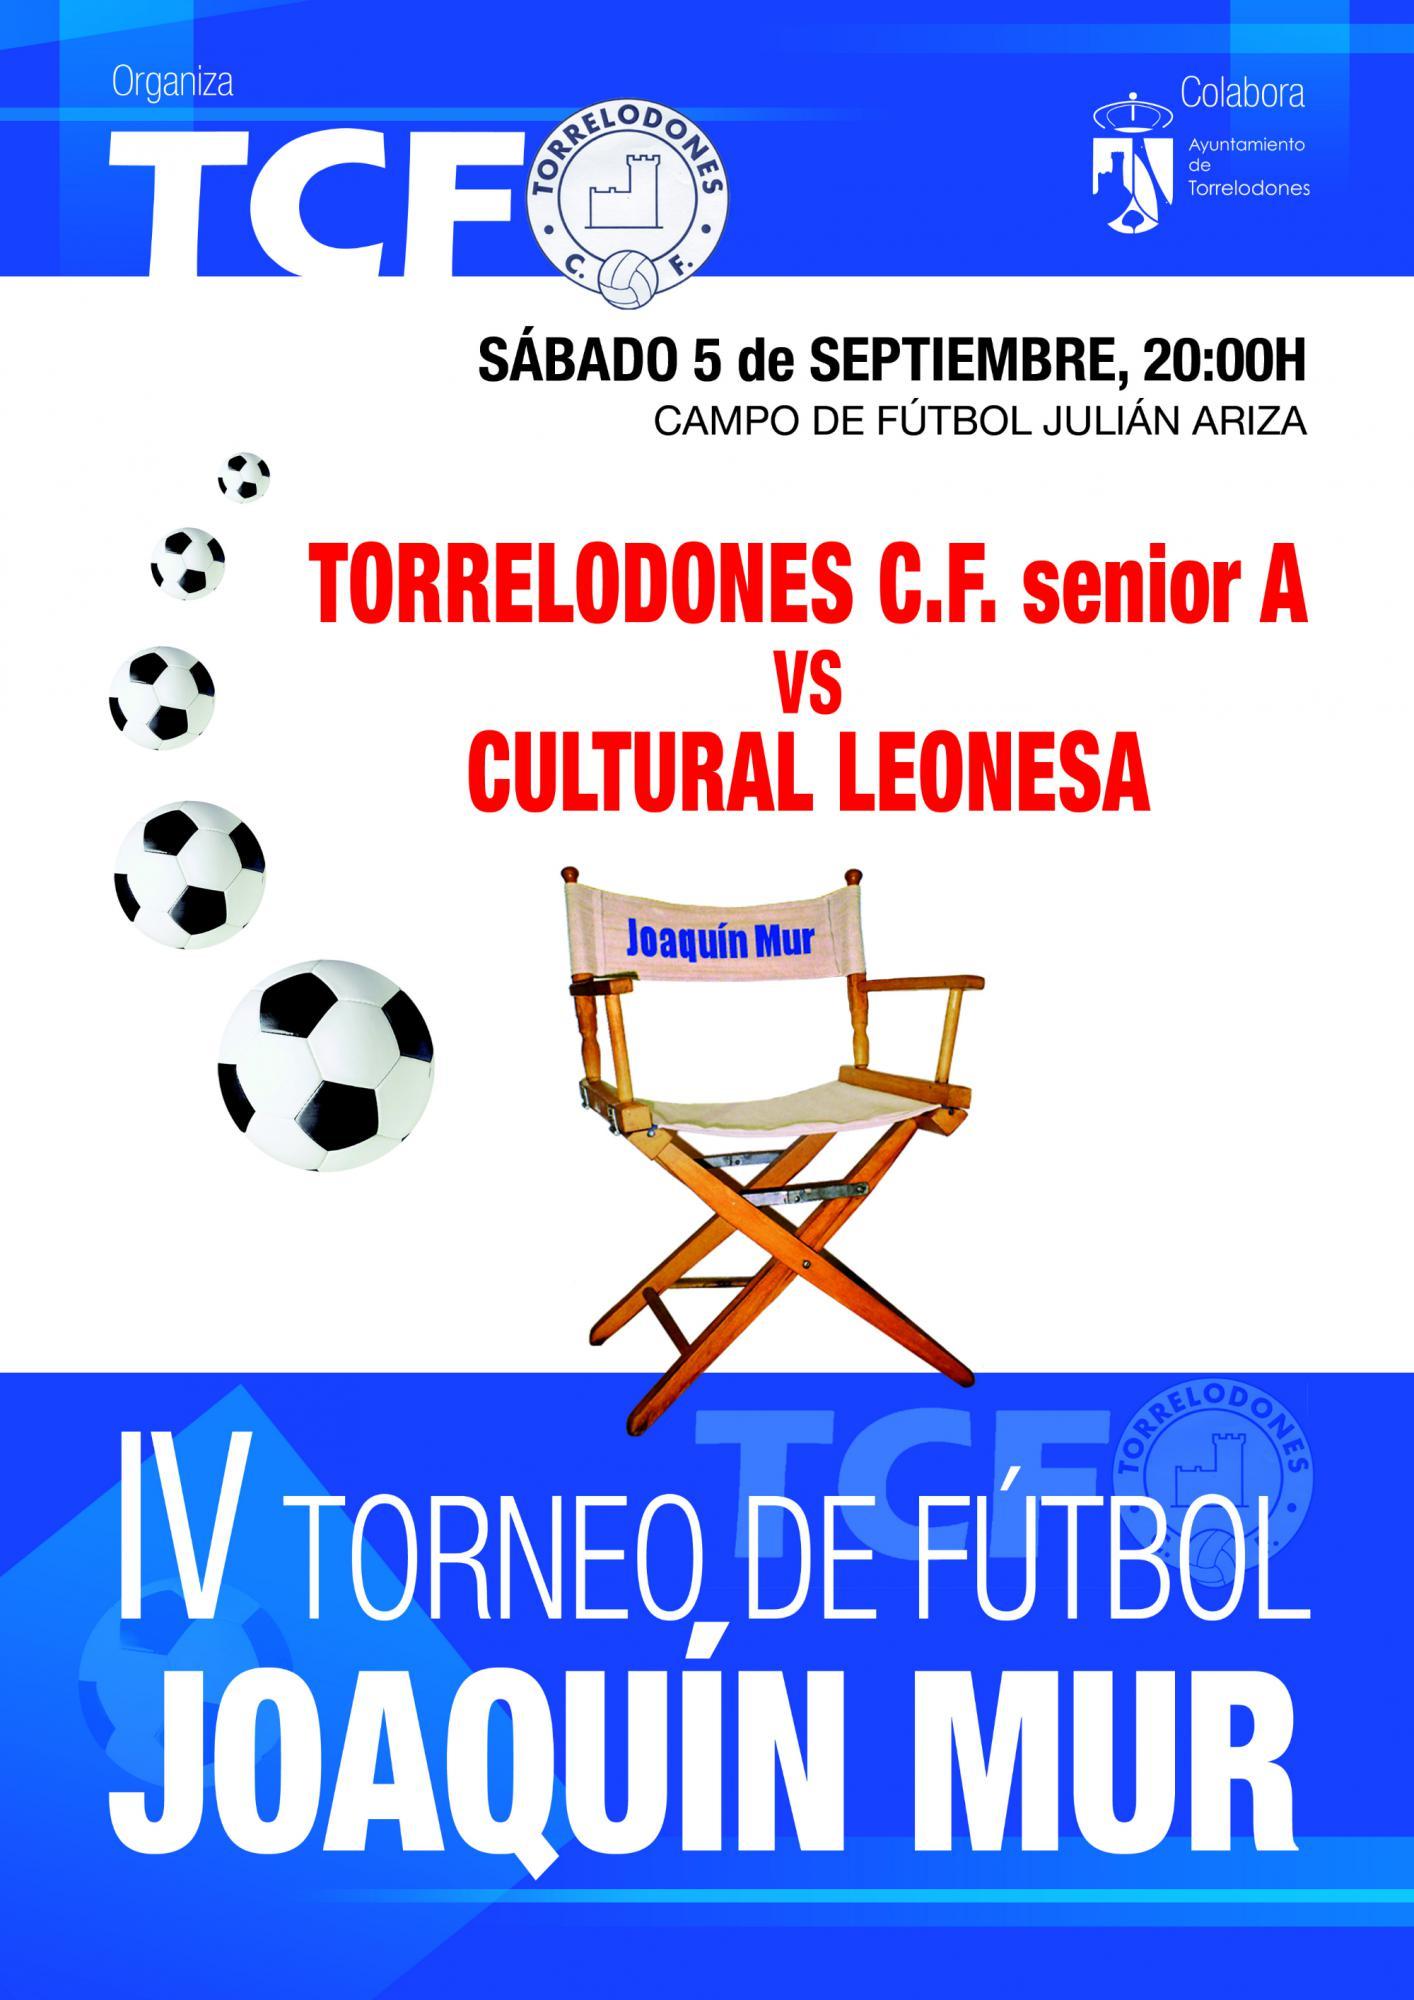 IV Torneo de Fútbol Joaquín Mur